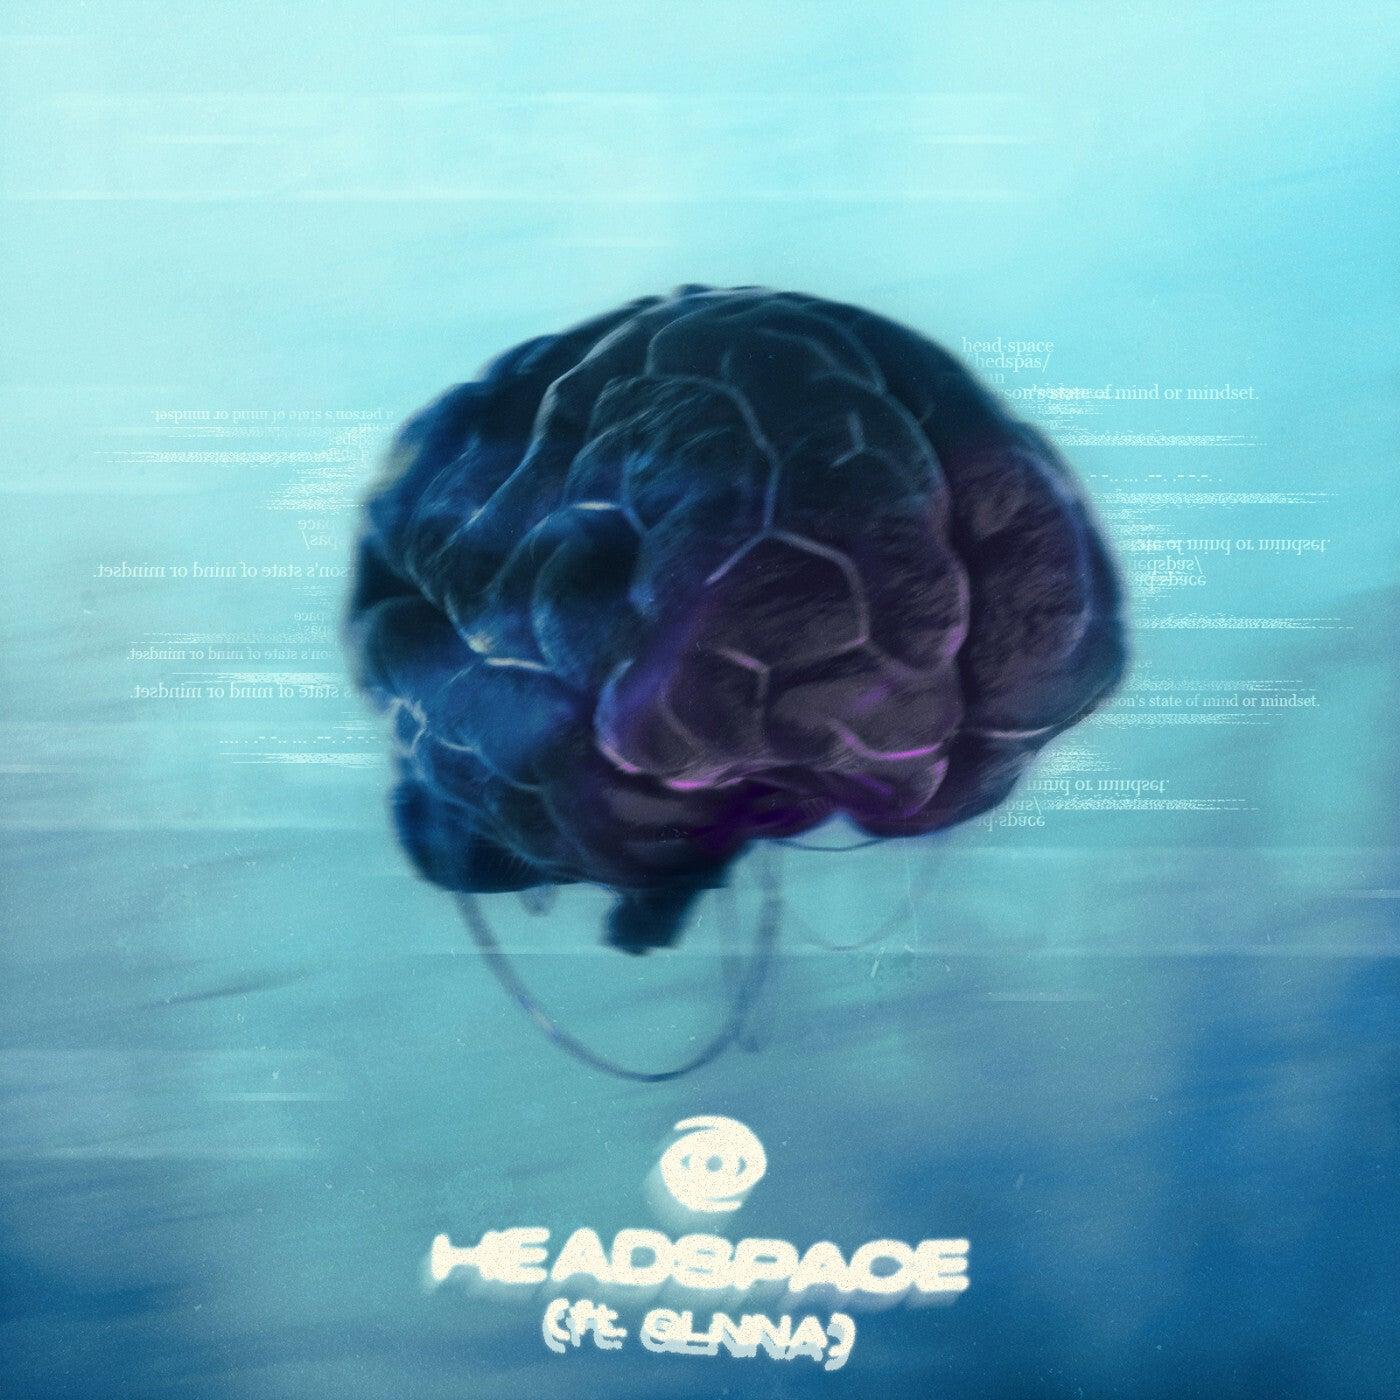 HEADSPACE (feat. GLNNA) (Original Mix)